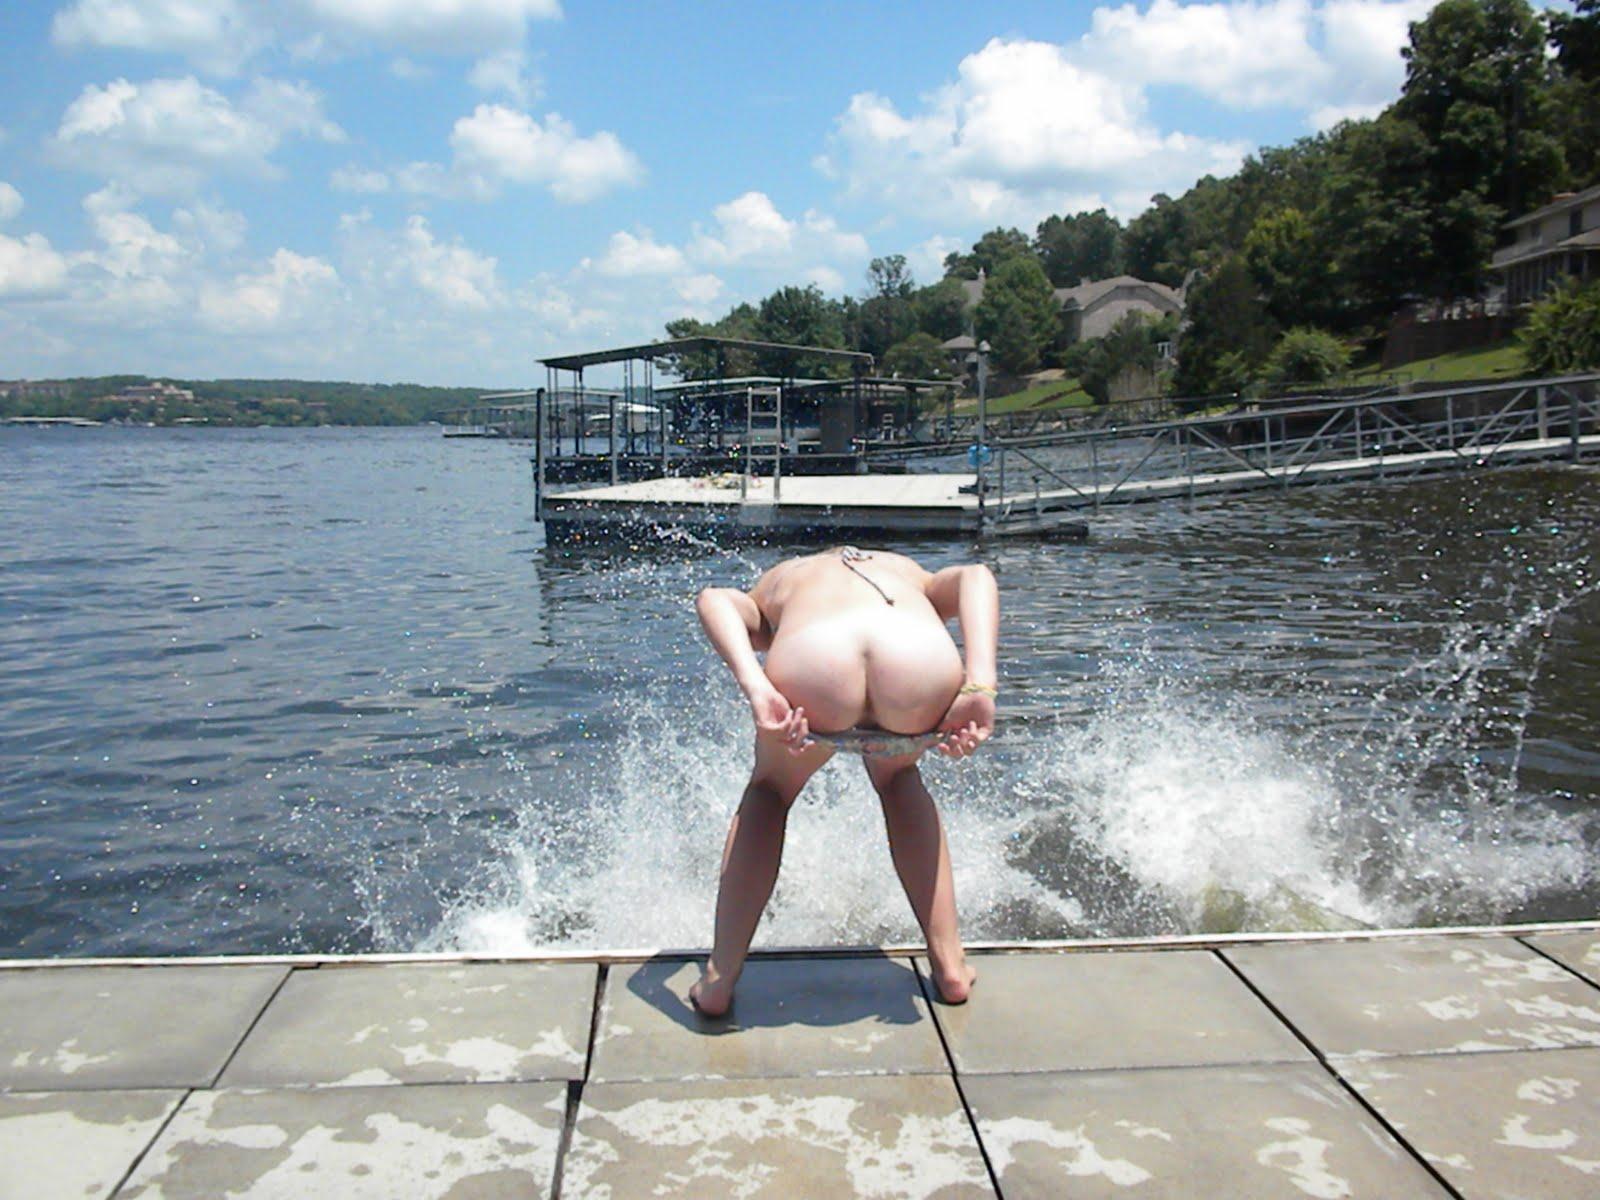 Naked teen movietures mooning gay austin 5